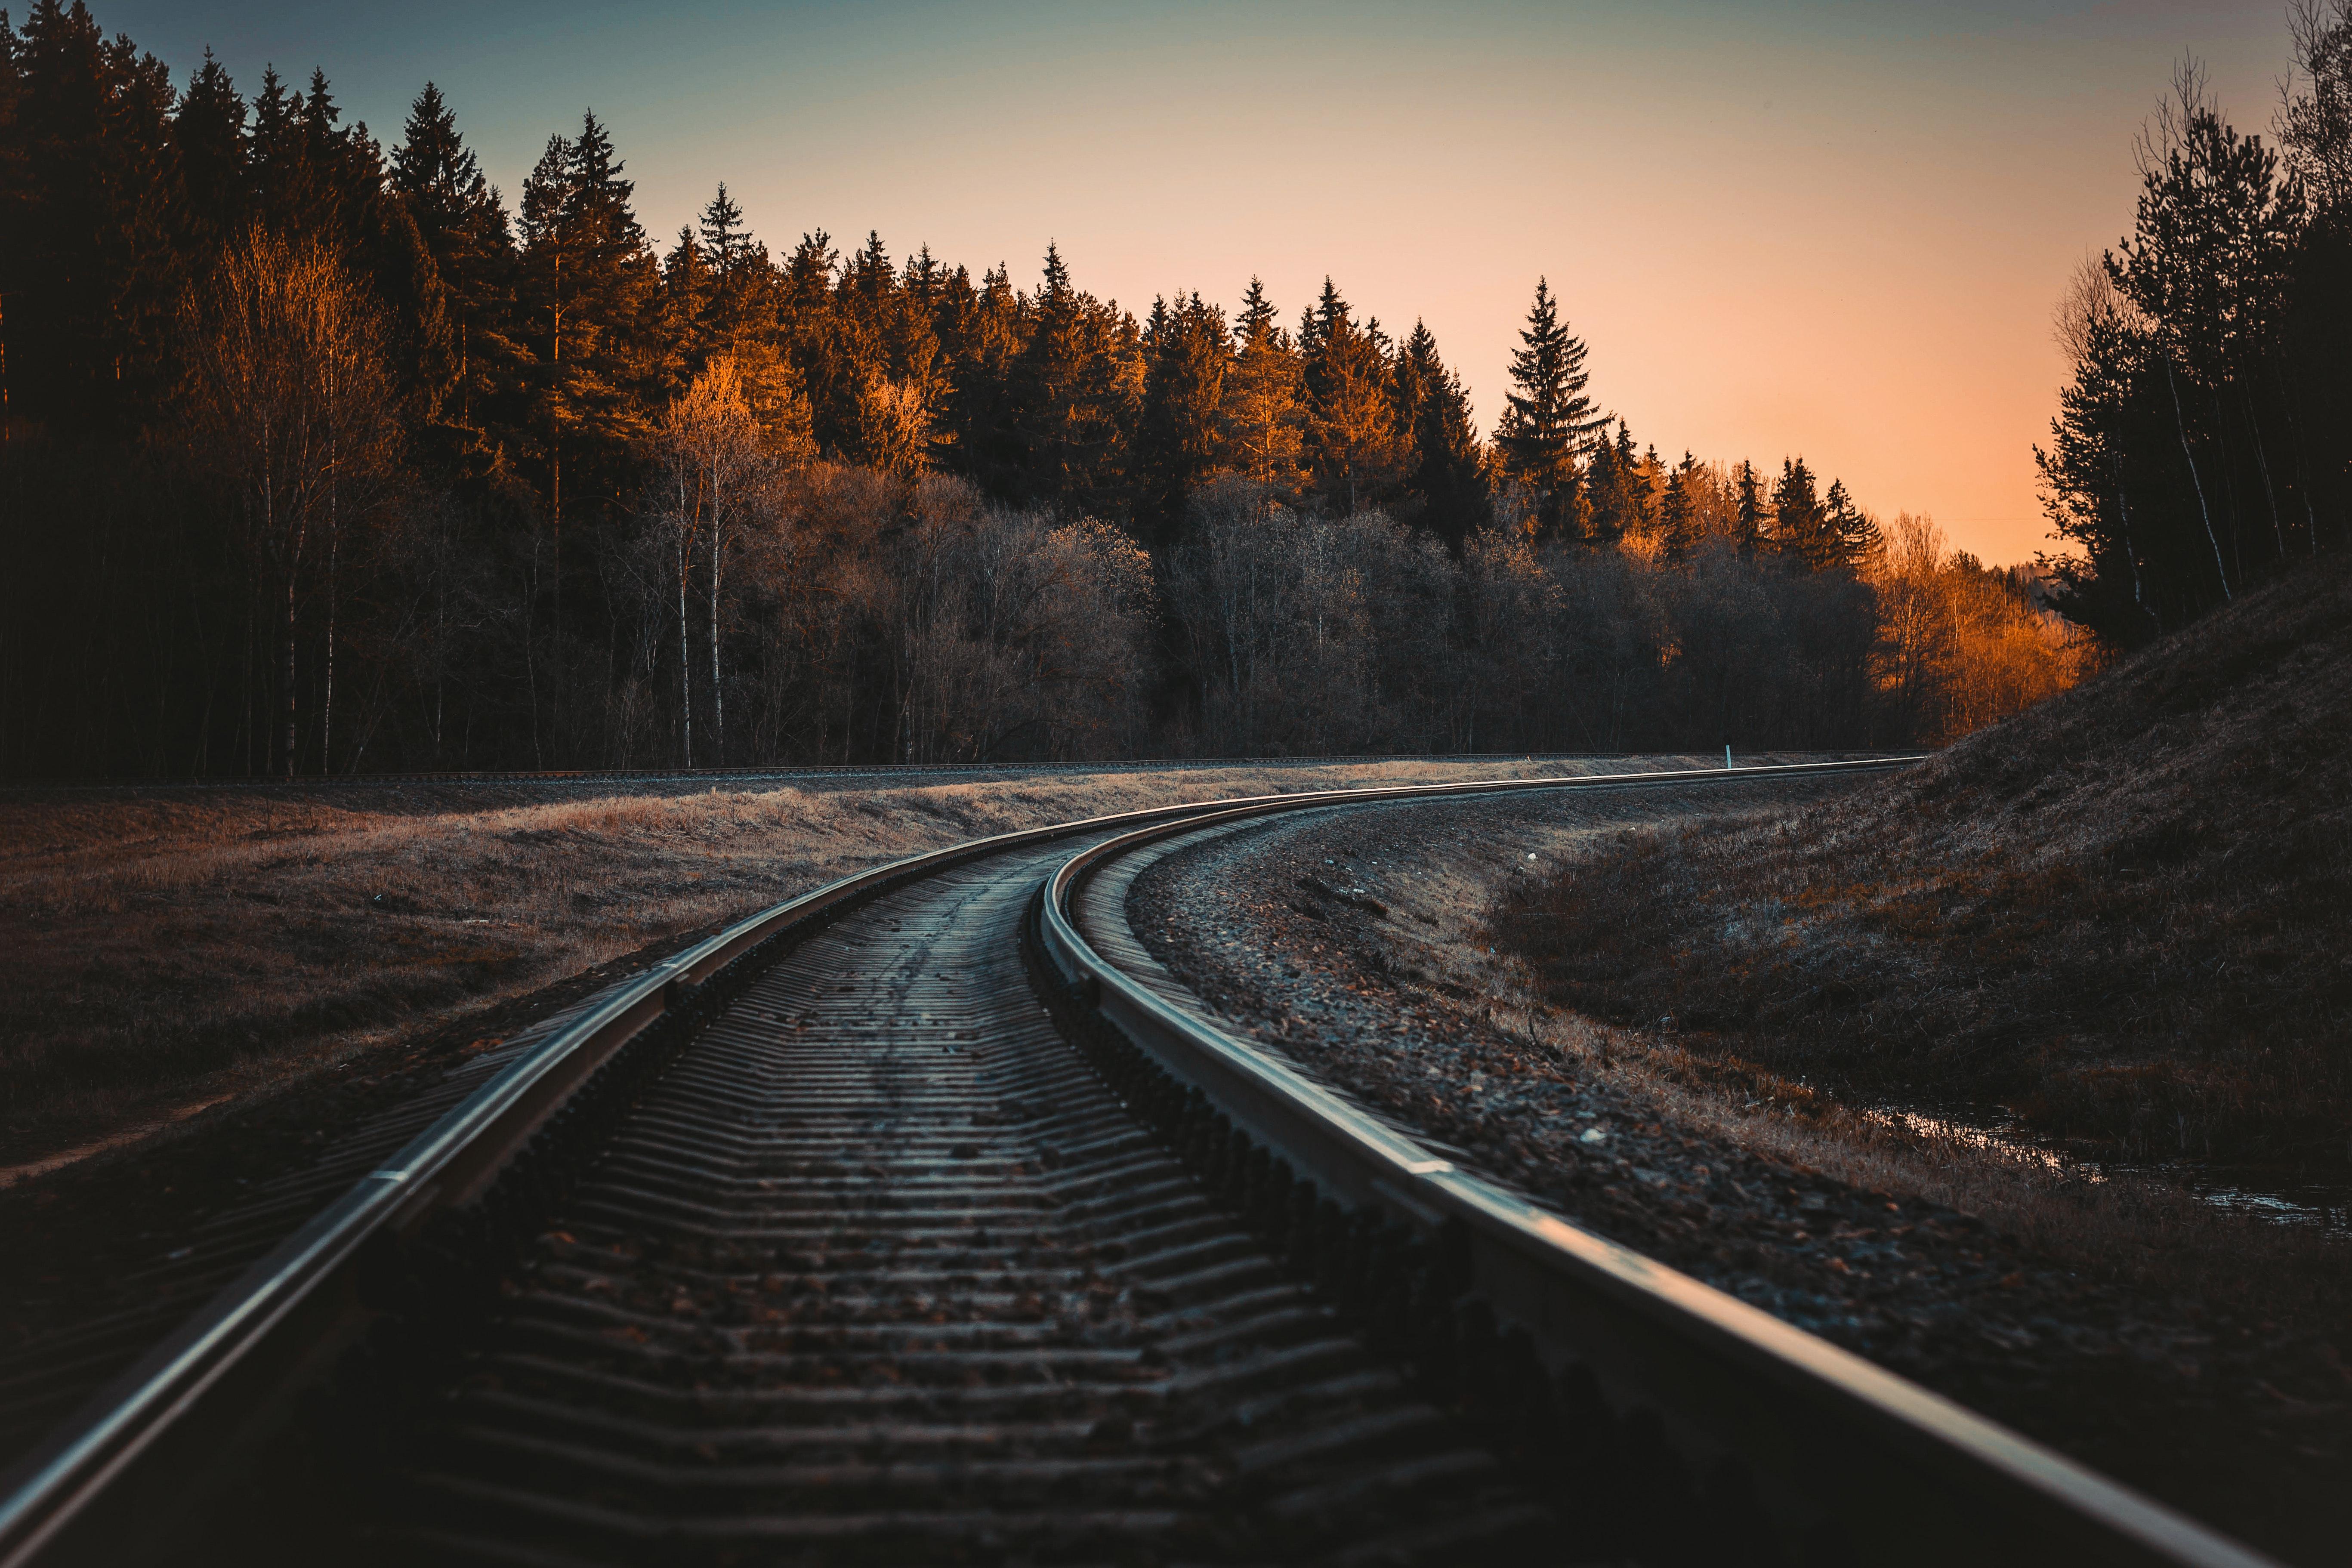 Train rail during golden hour photo